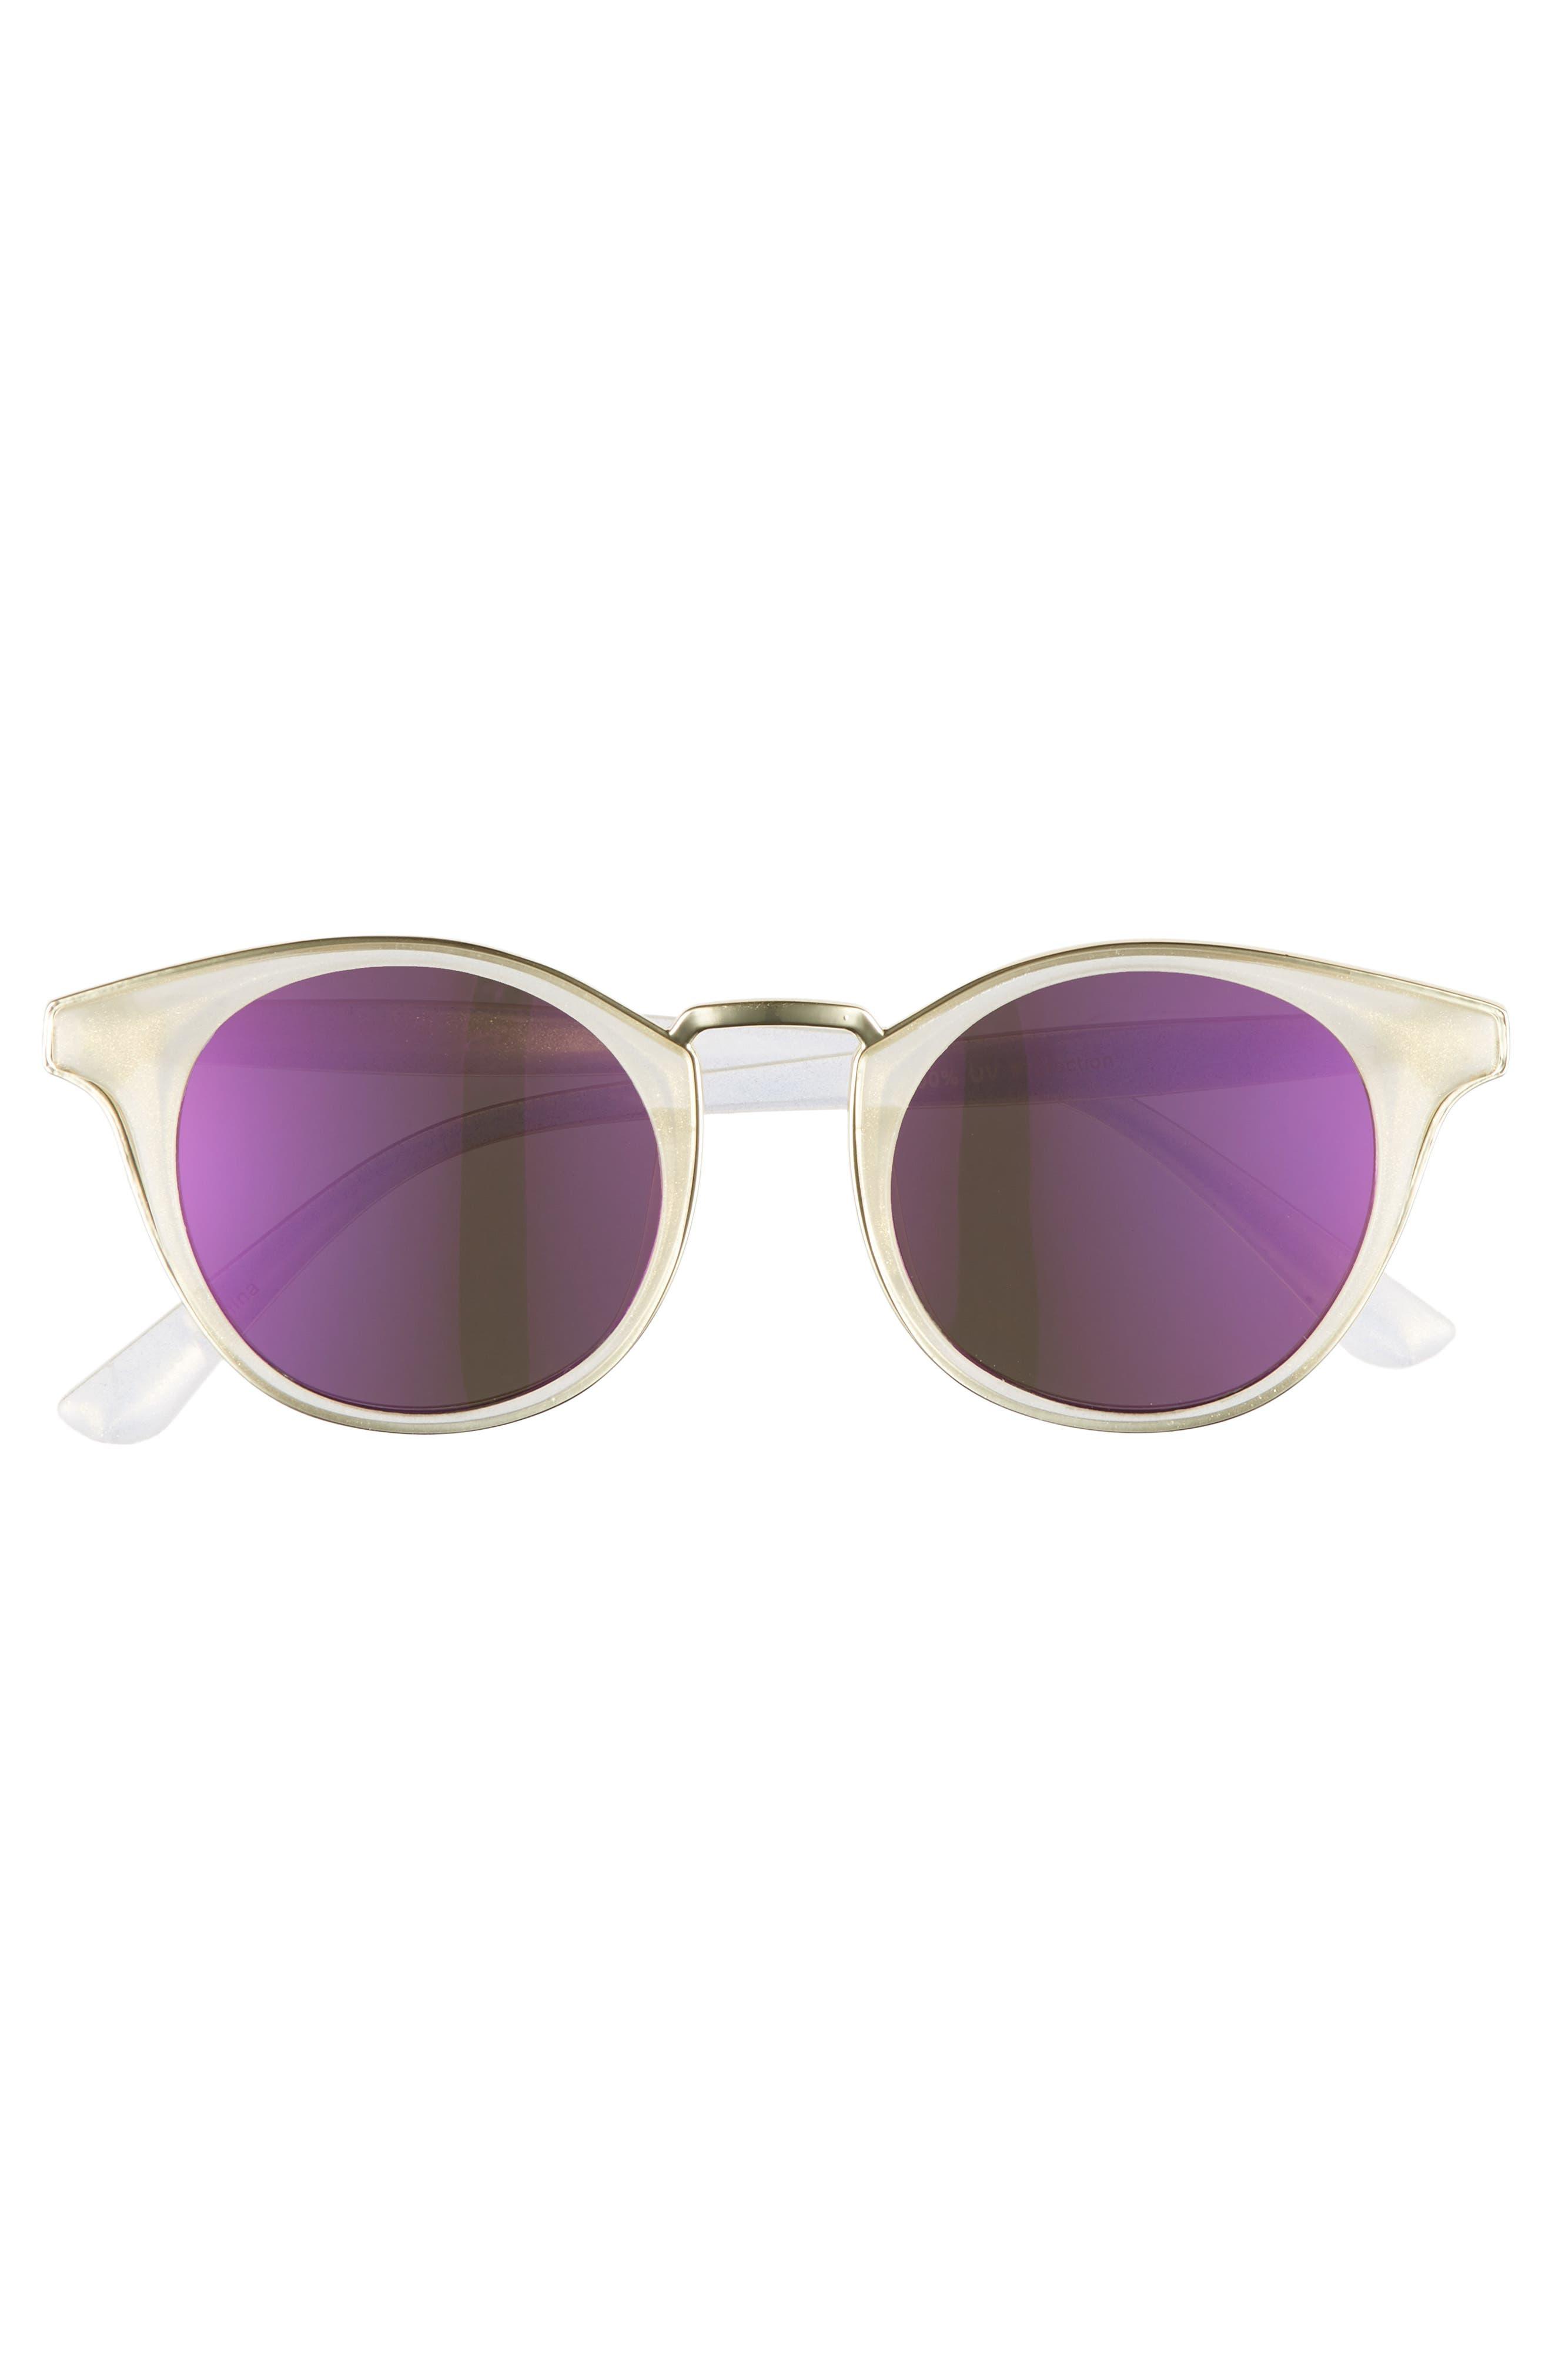 47mm Metal Trim Round Sunglasses,                             Alternate thumbnail 3, color,                             Clear/ Blue